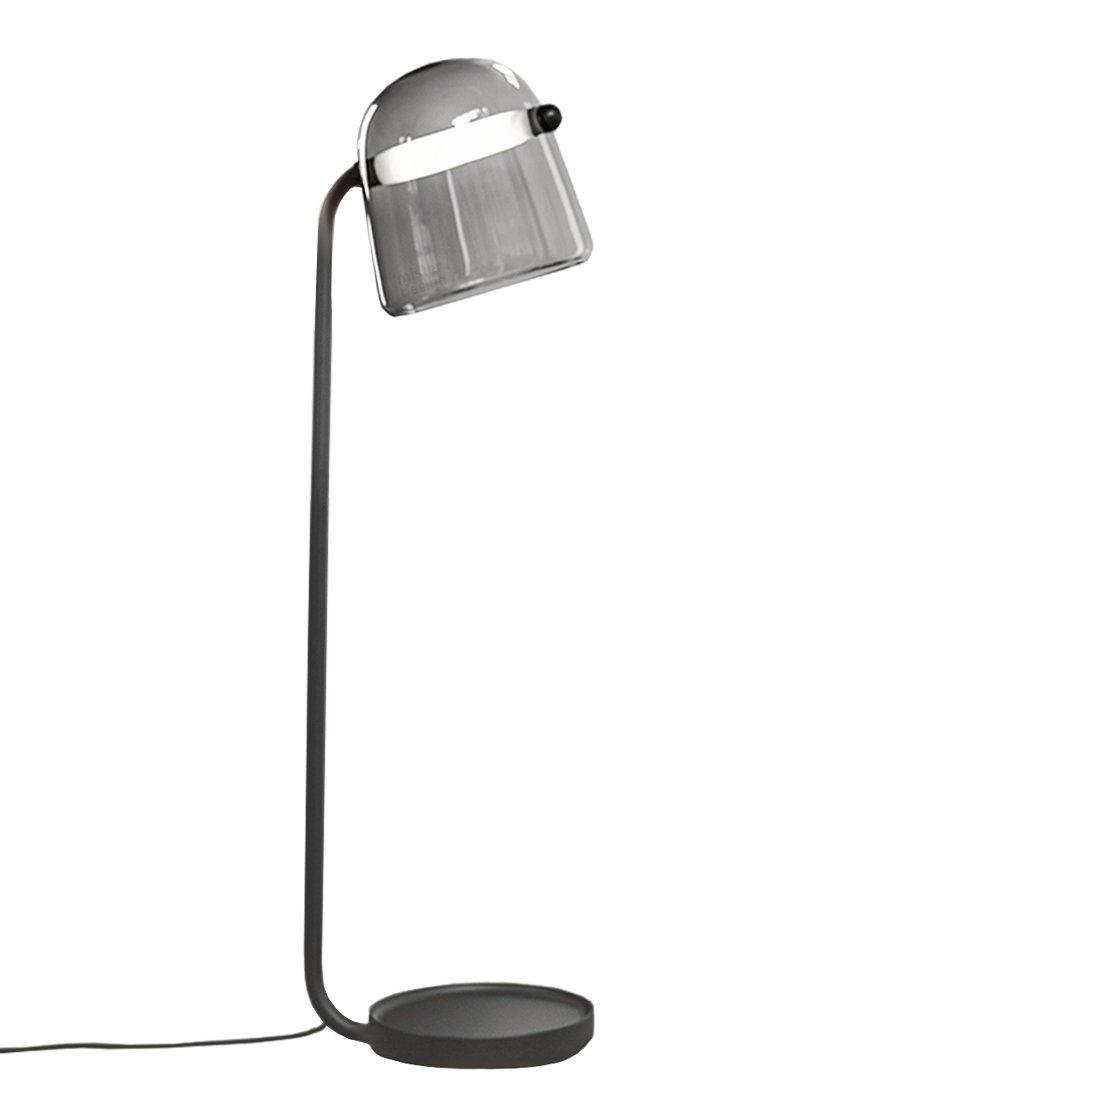 Brokis Mona Vloerlamp Medium Donkergrijs - Zwarte Body